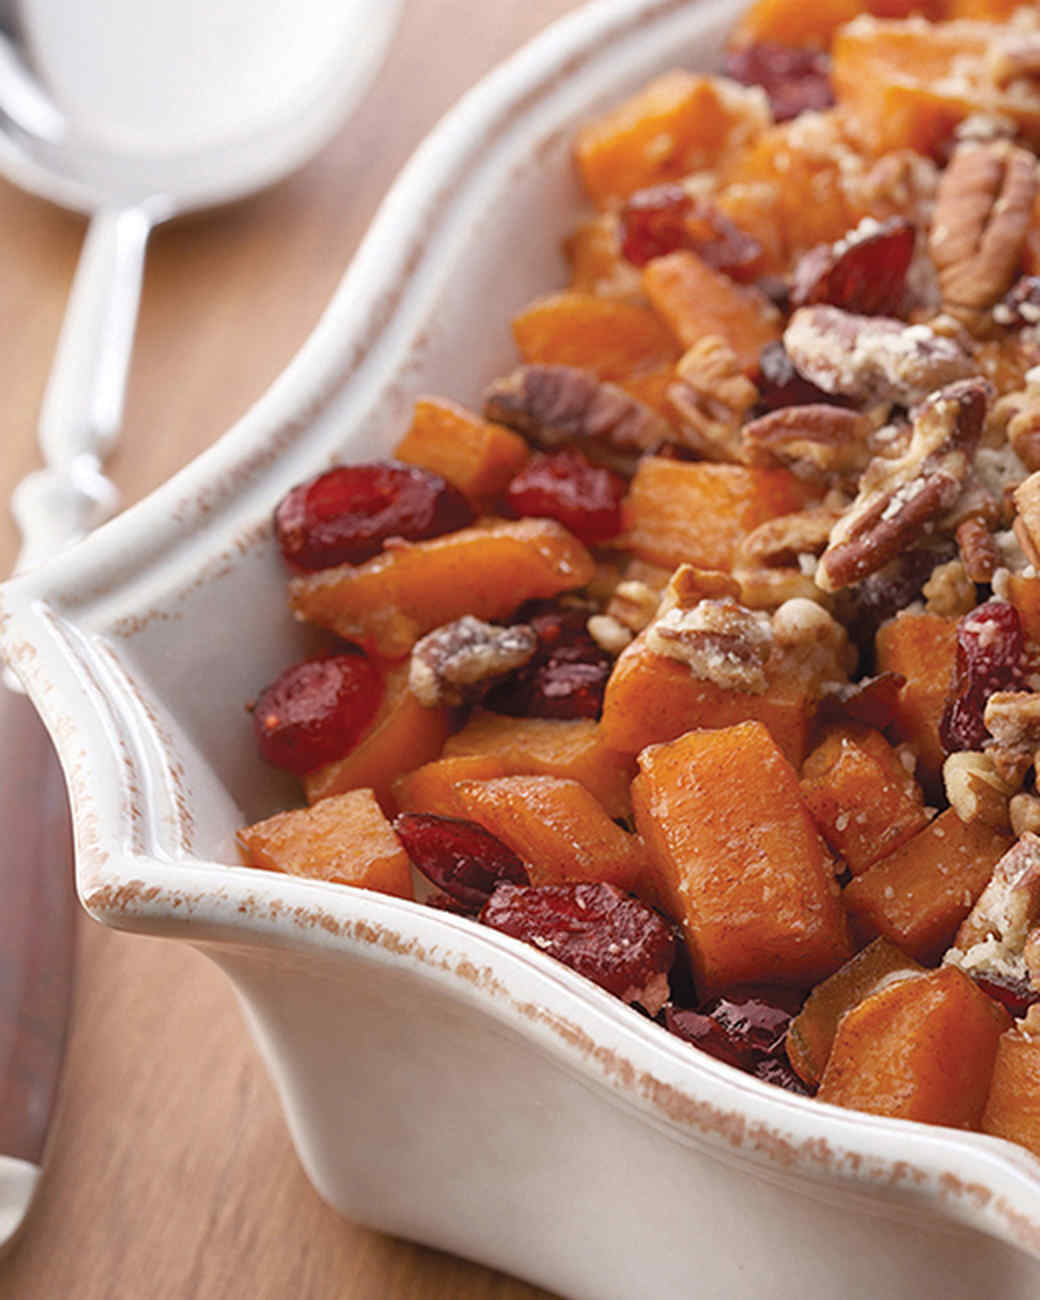 roasted-sweet-potatoes-w-cinnamon_520x650.jpg